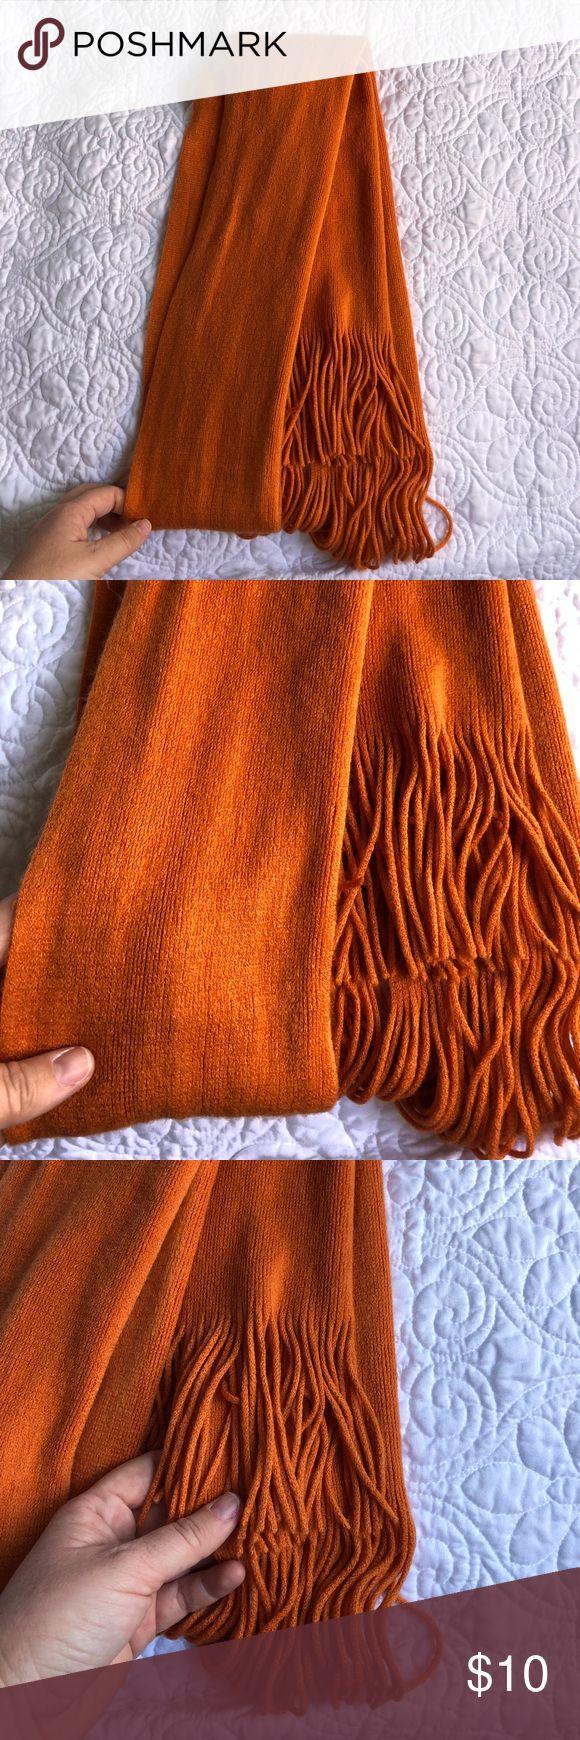 Super soft Merona Orange Scarf Super soft merona orange scarf in EUC Merona Accessories Scarves & Wraps